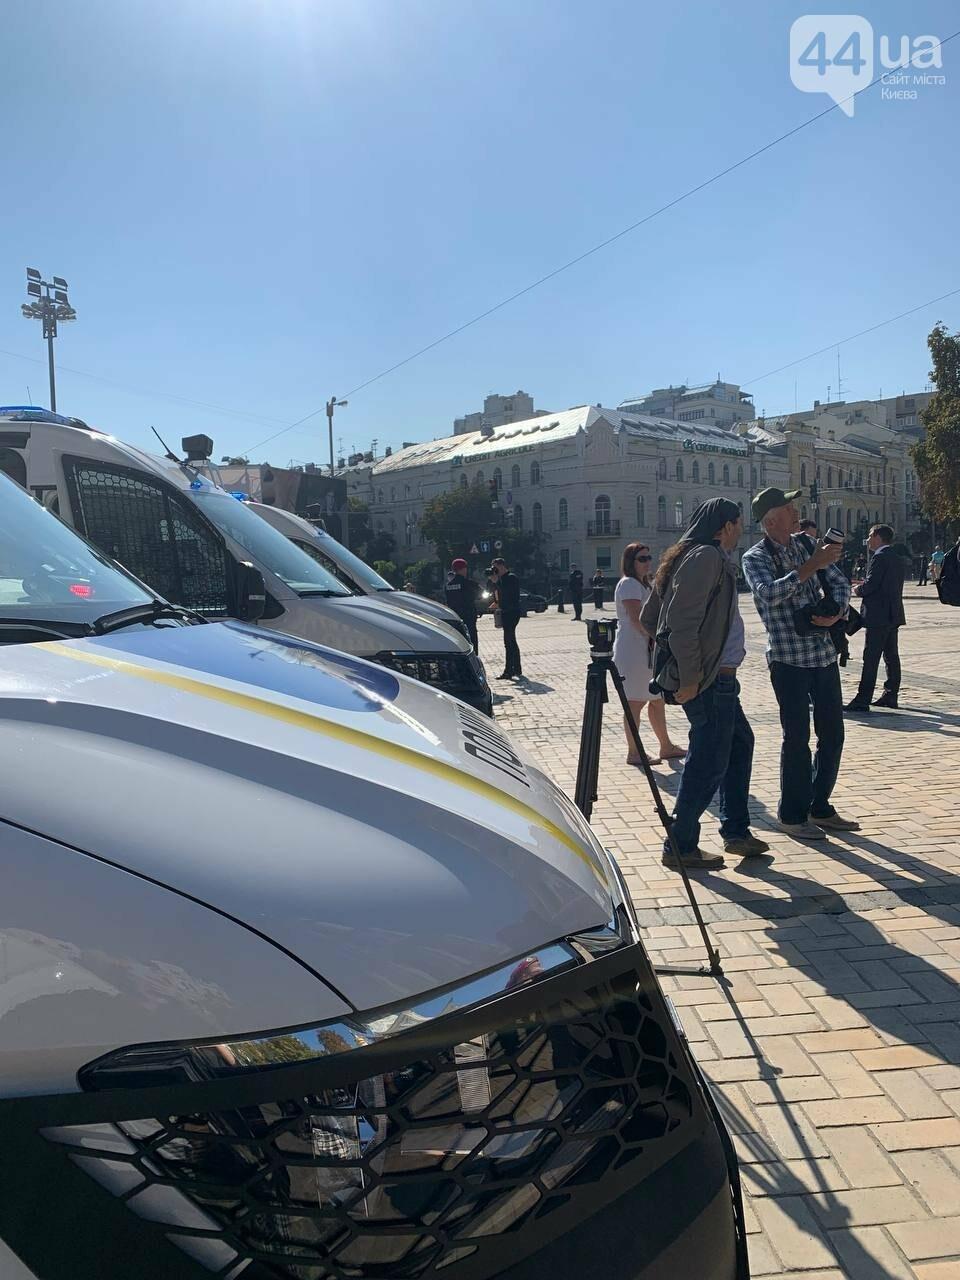 Почти 60 новых автомобилей: ЕС подарил Нацполиции технику на сумму 3,4 млн евро, - ФОТО, ВИДЕО, фото-11, 44.ua